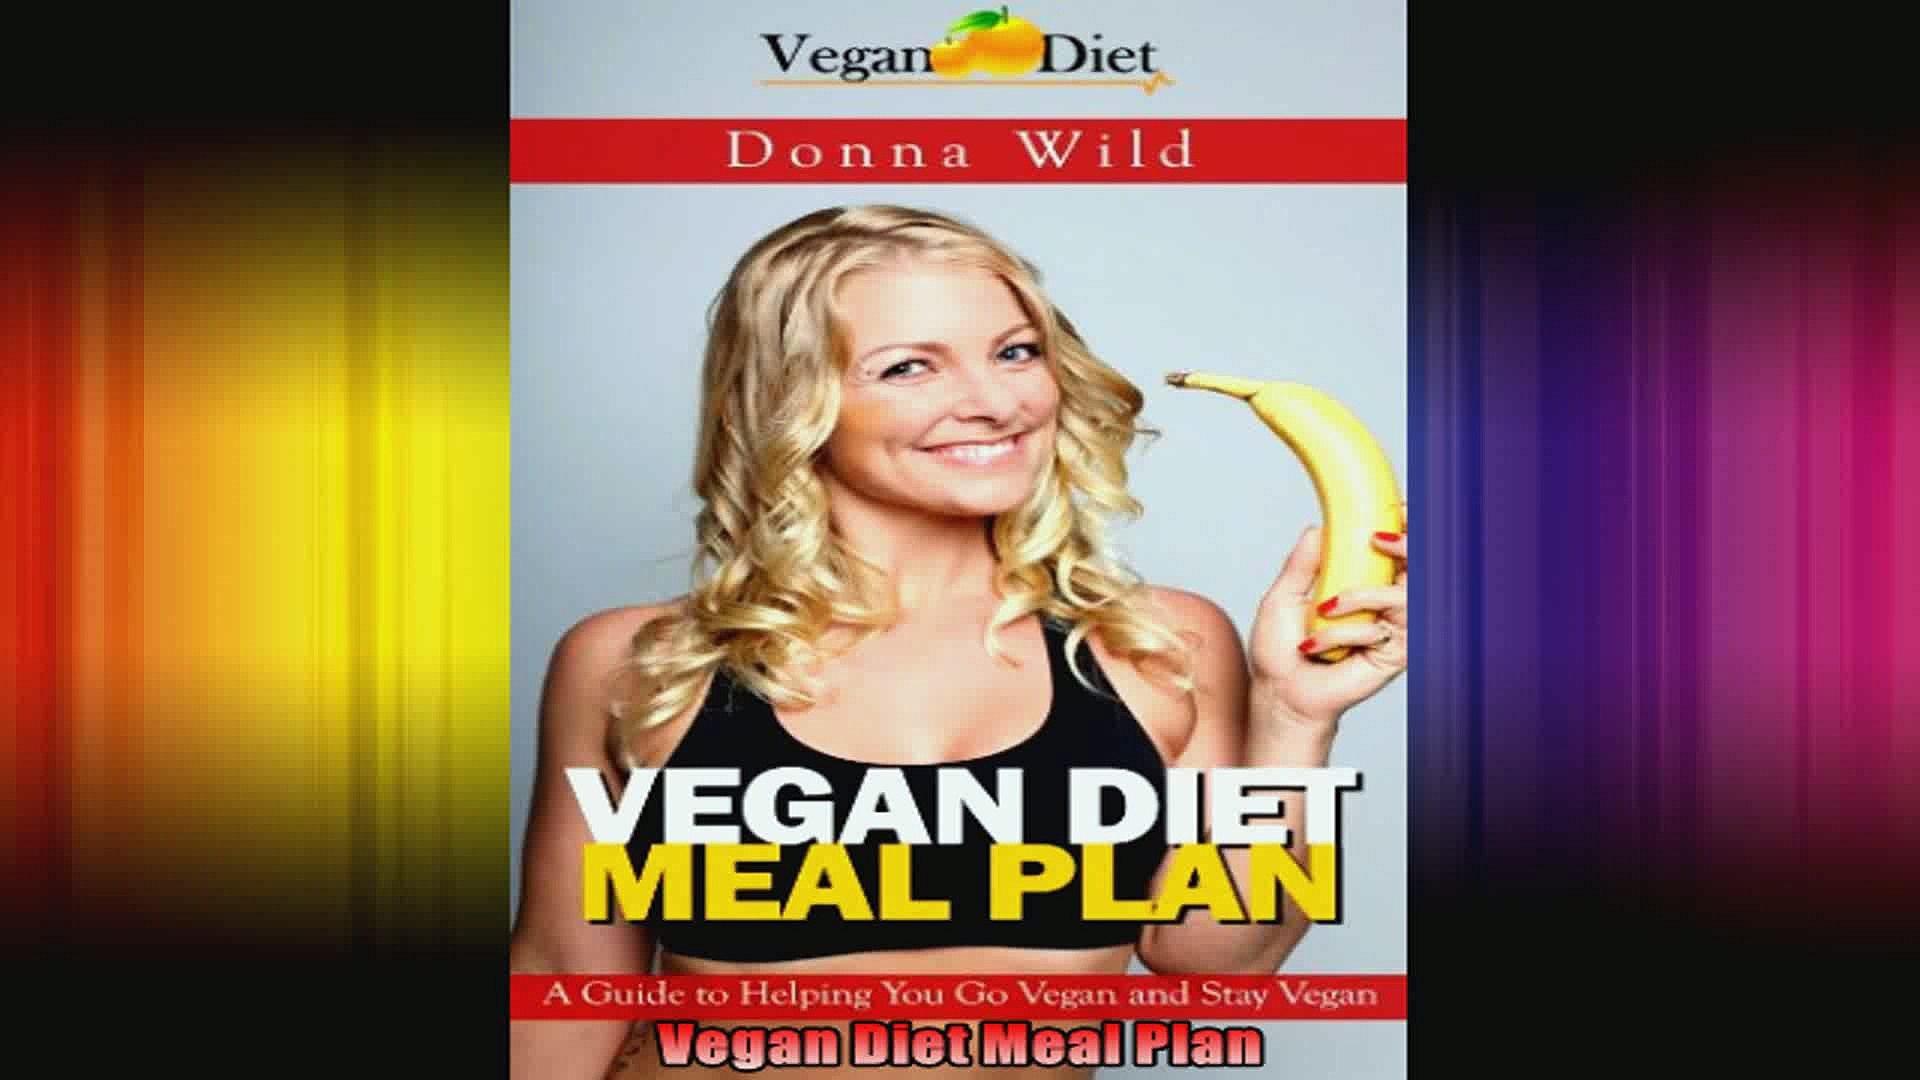 Vegan Diet Meal Plan